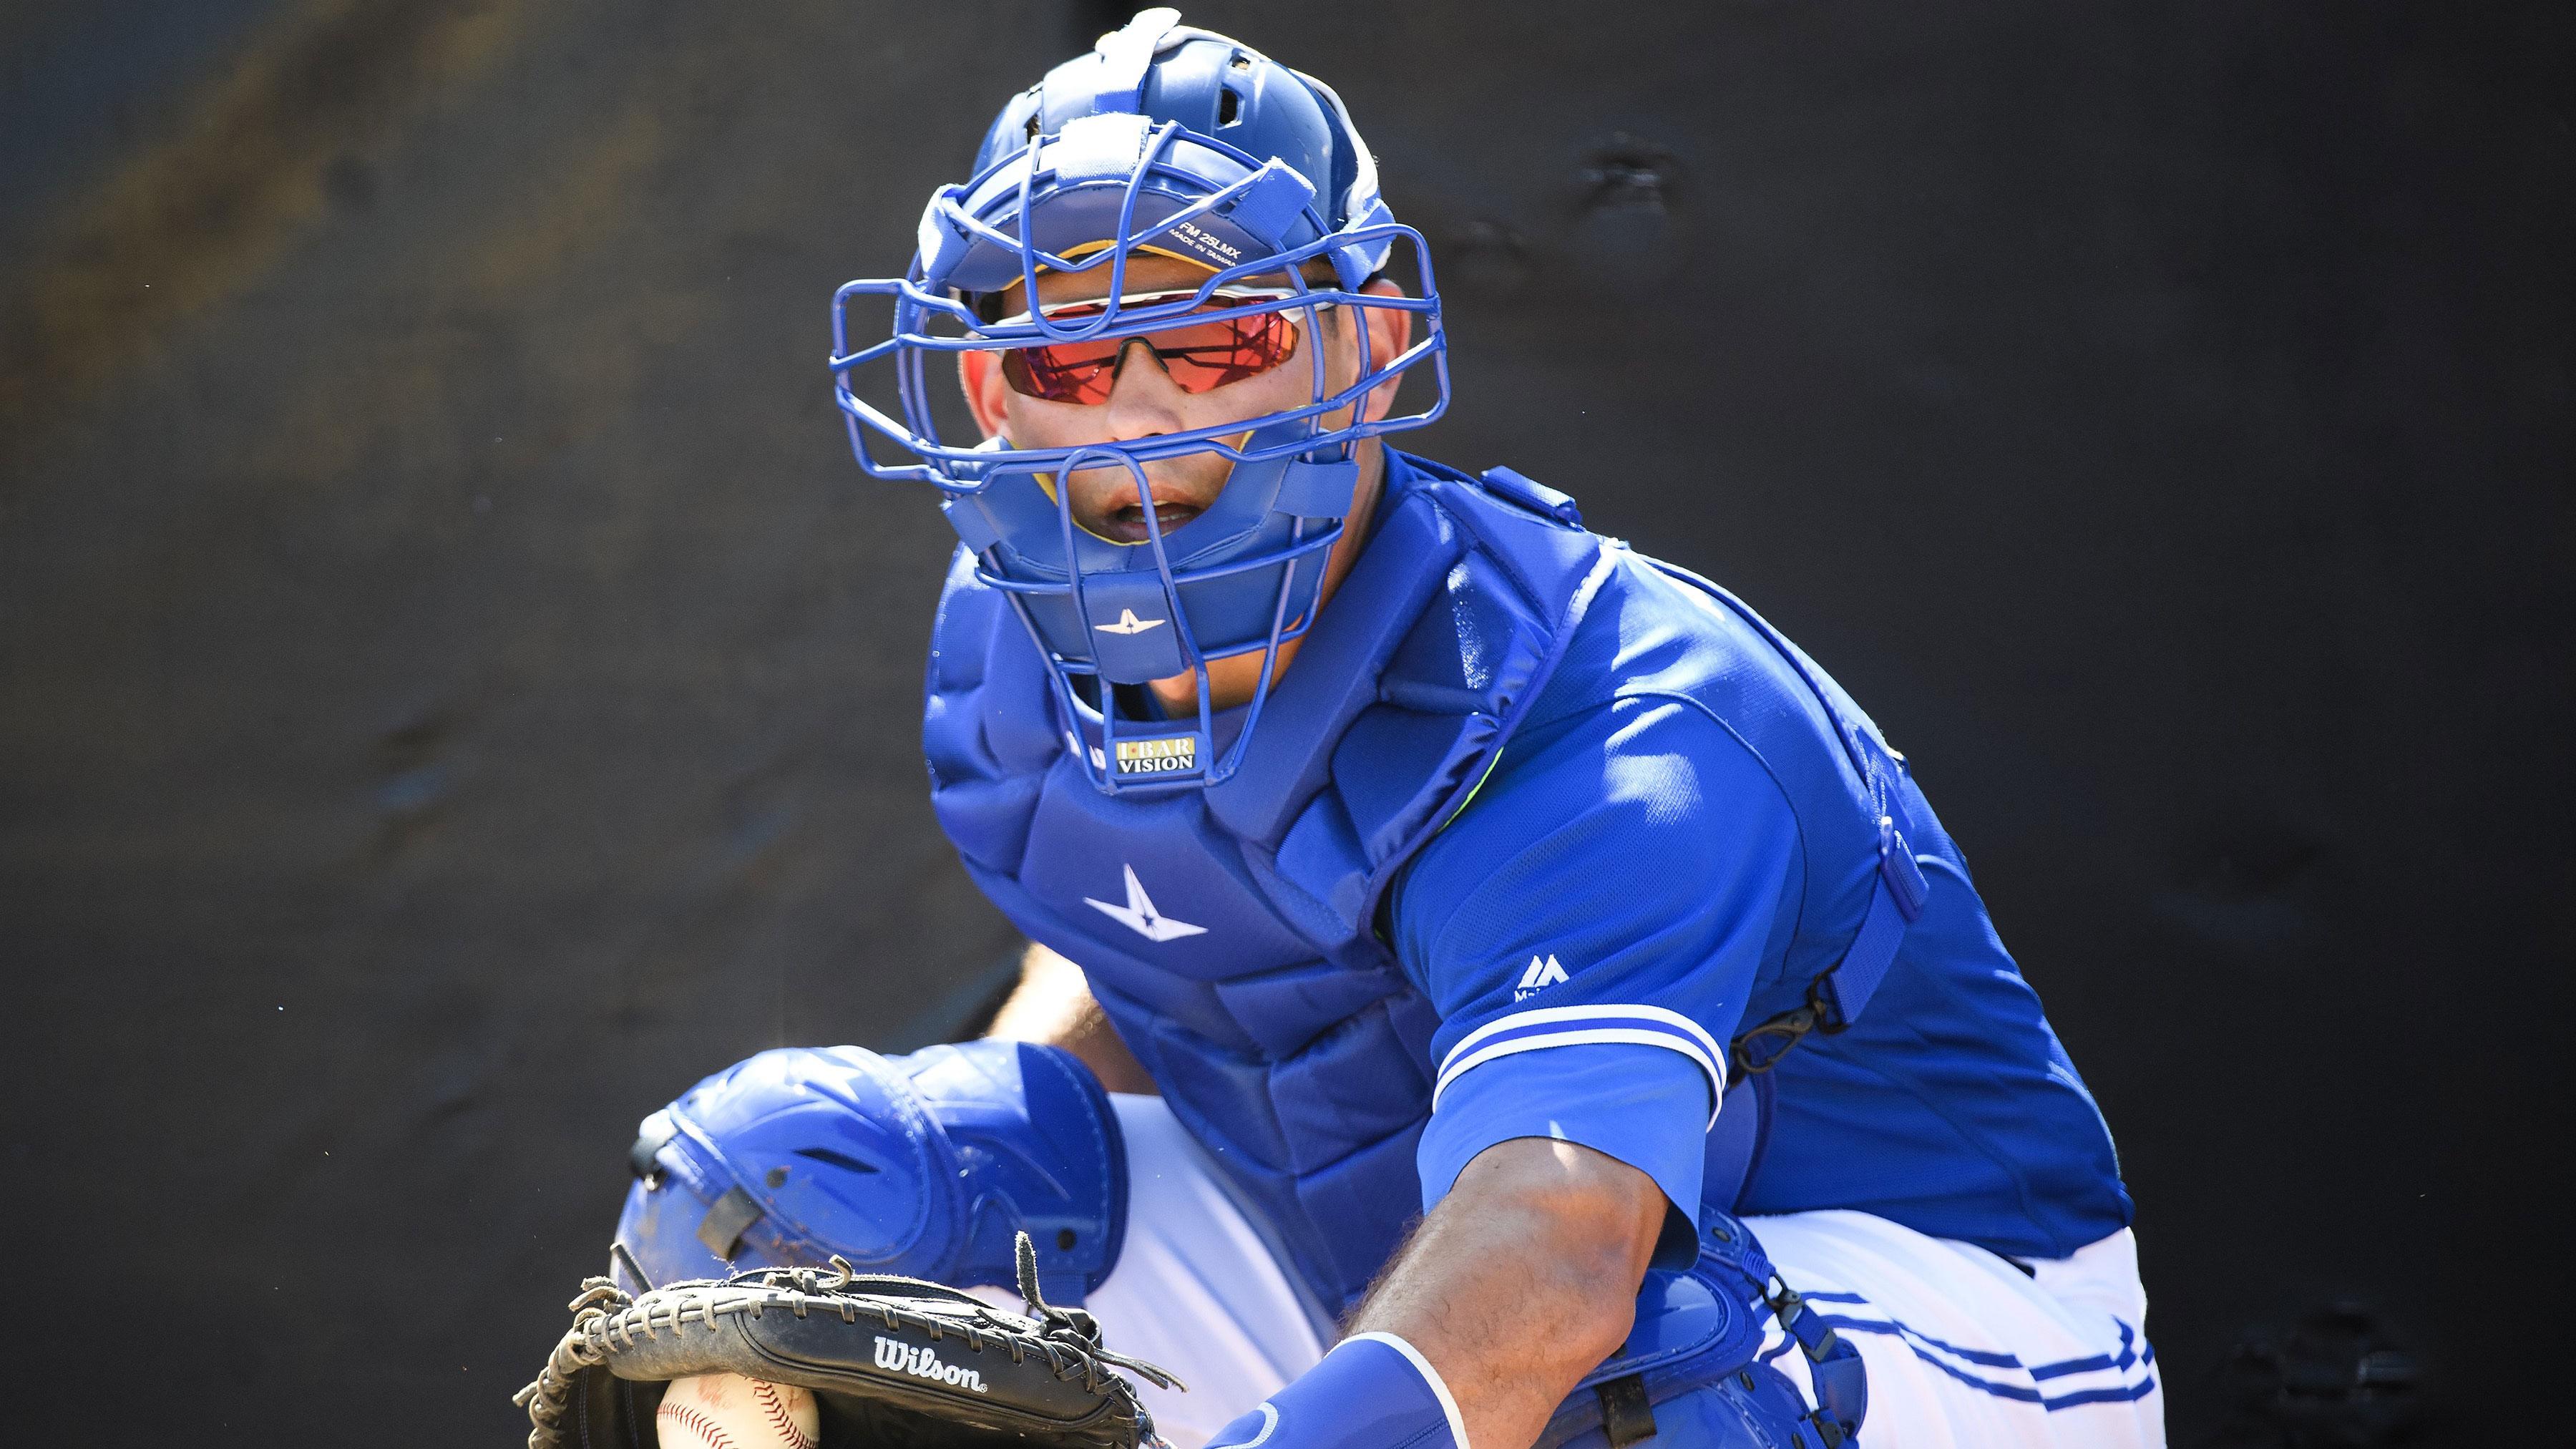 Blue Jays catchers Maile, Jansen fine tuning pitch presentation